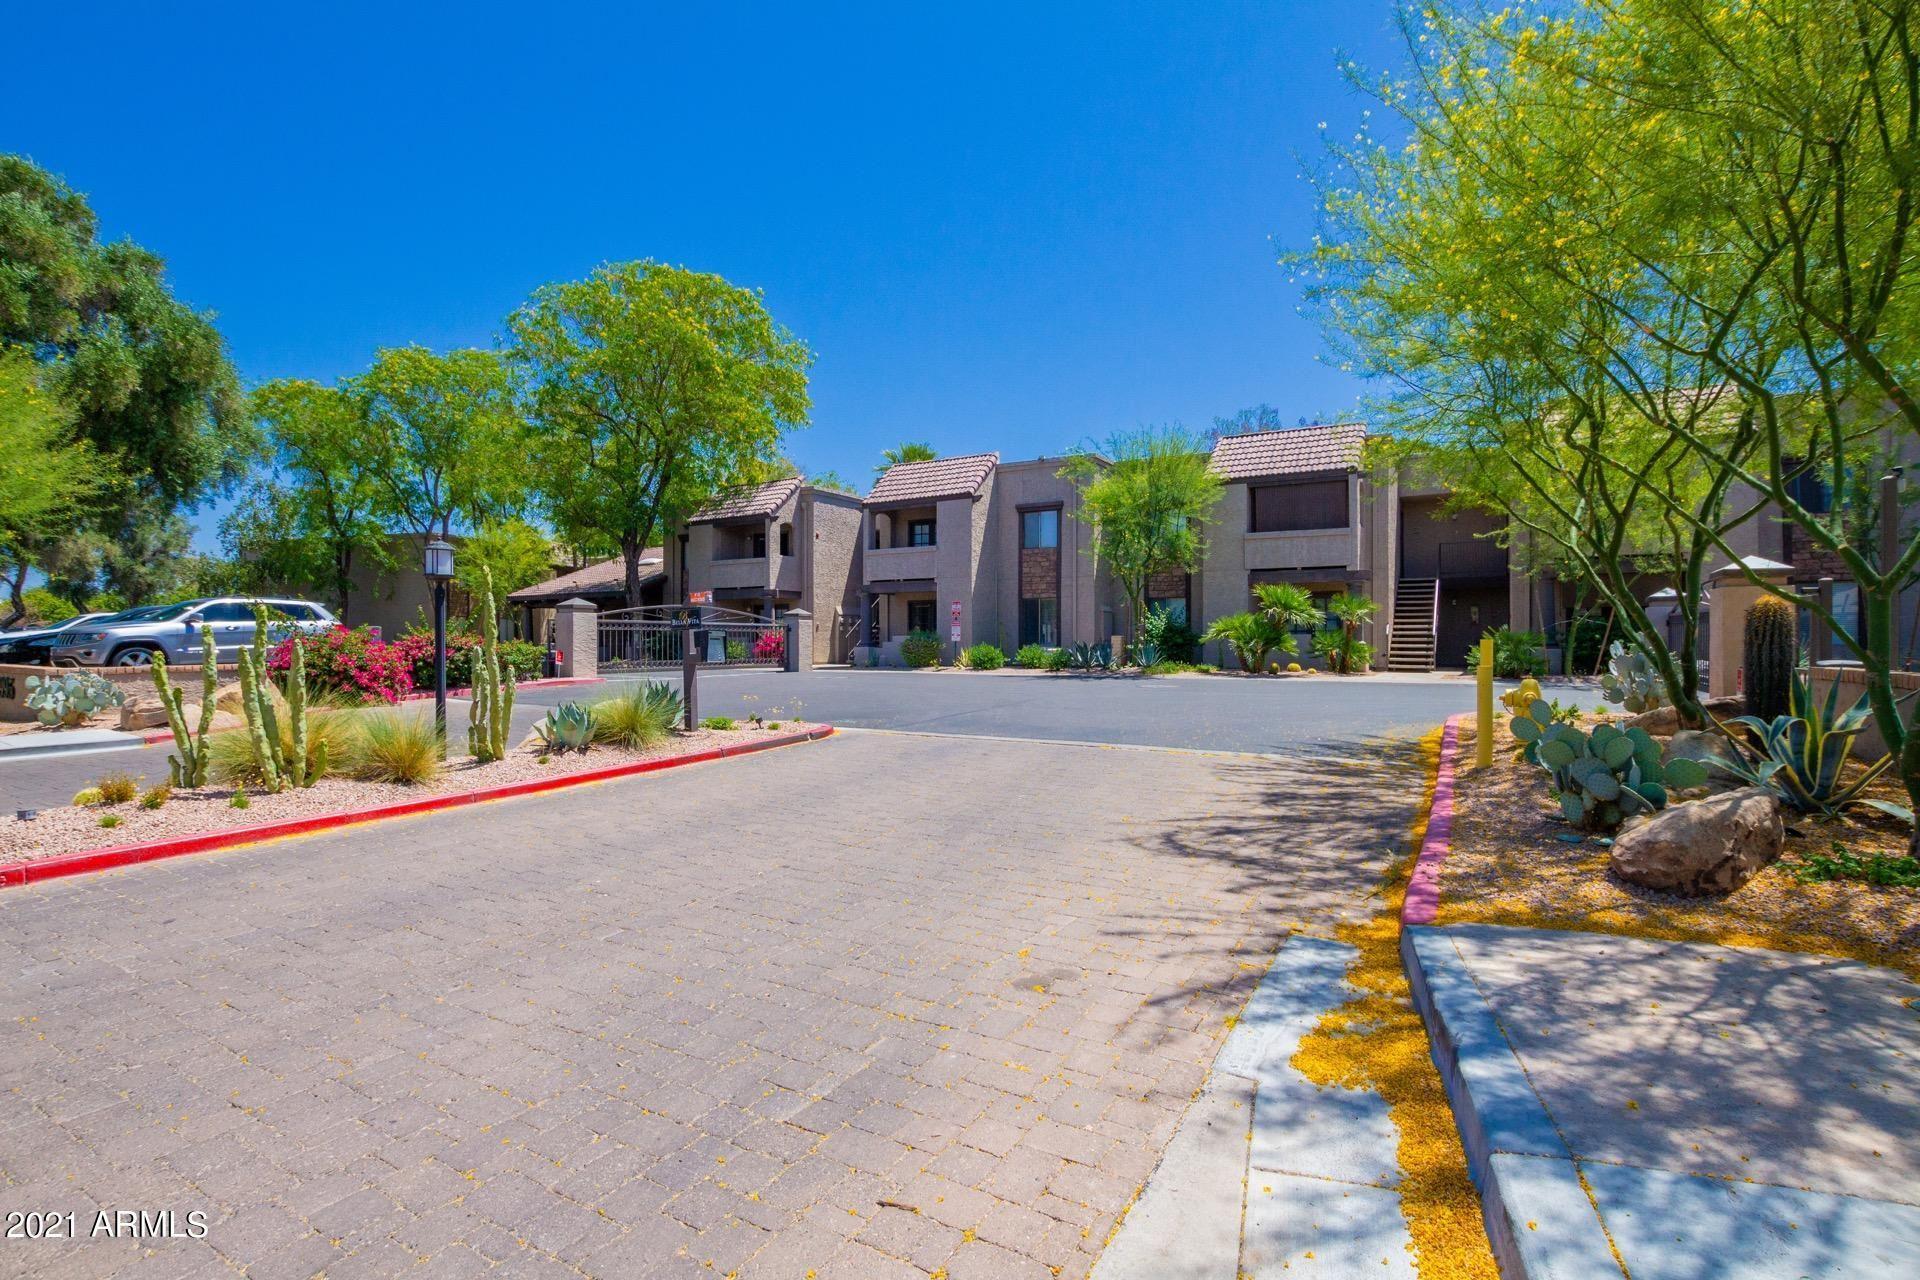 5995 N 78TH Street #1019, Scottsdale, AZ 85250 - MLS#: 6235464